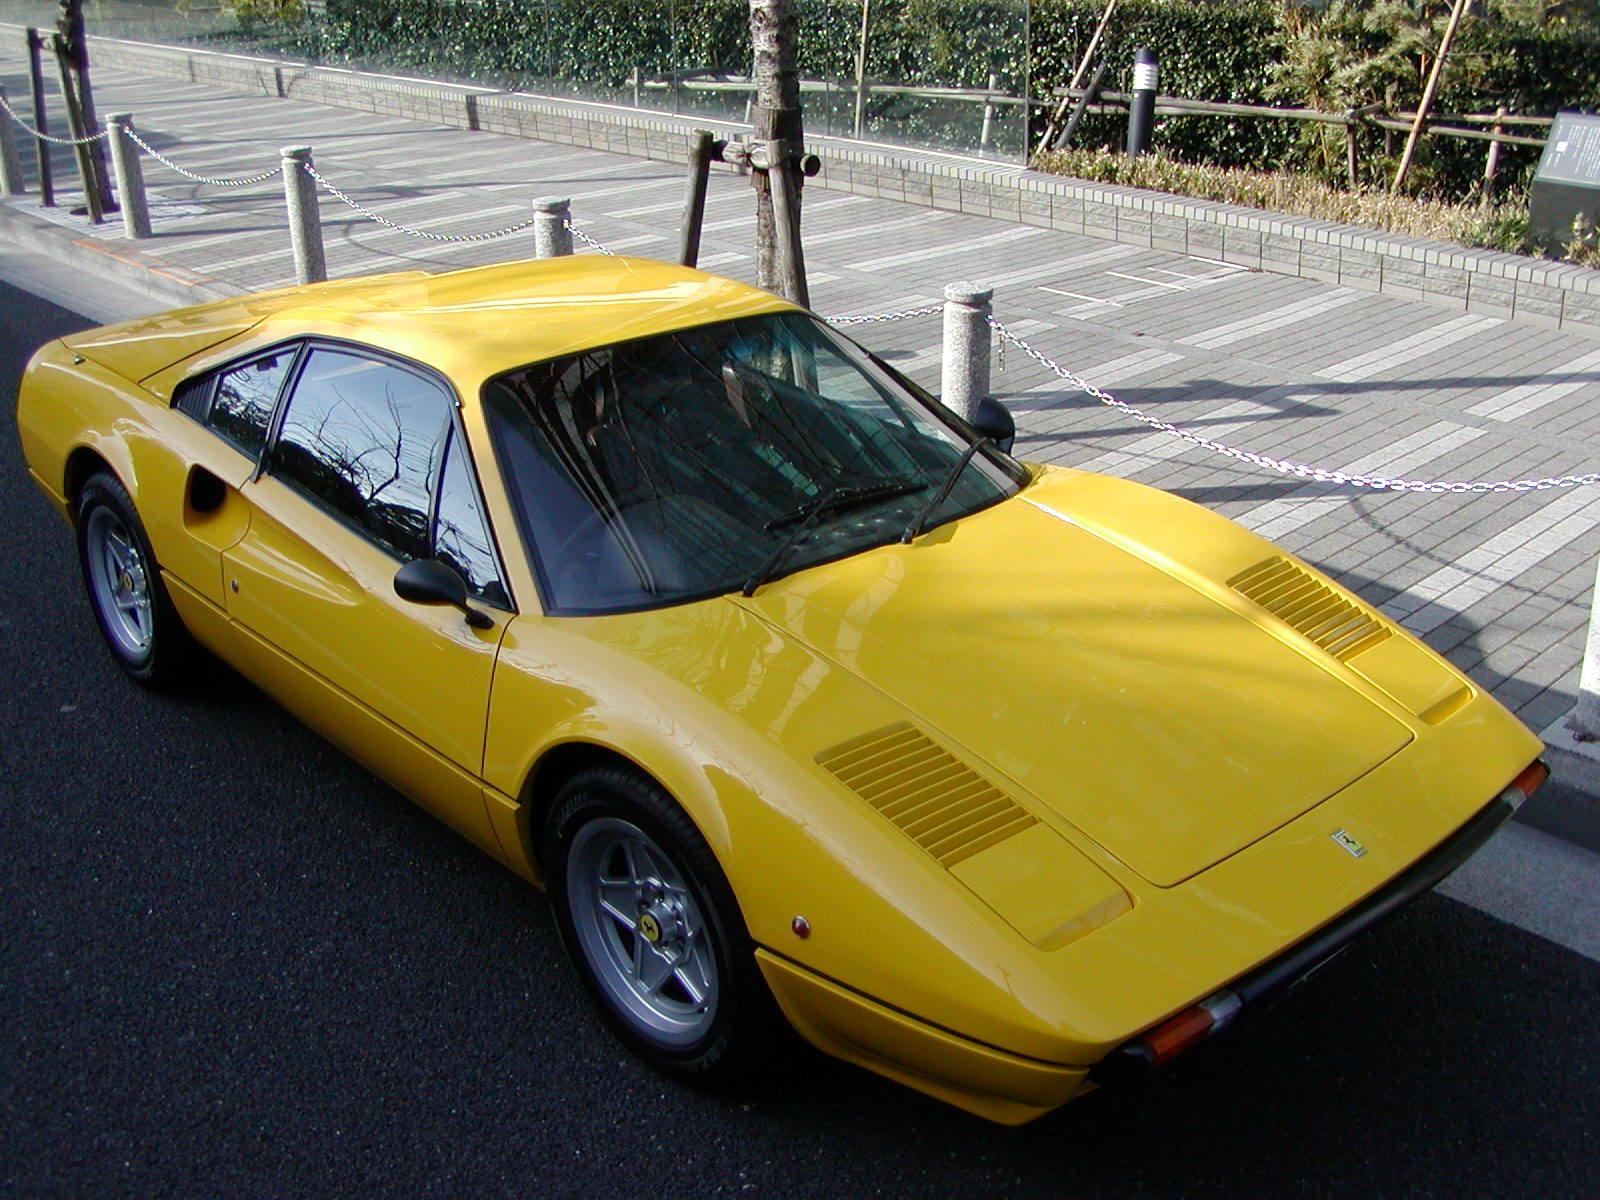 small Ferrari の造形の変化_a0129711_22583516.jpg